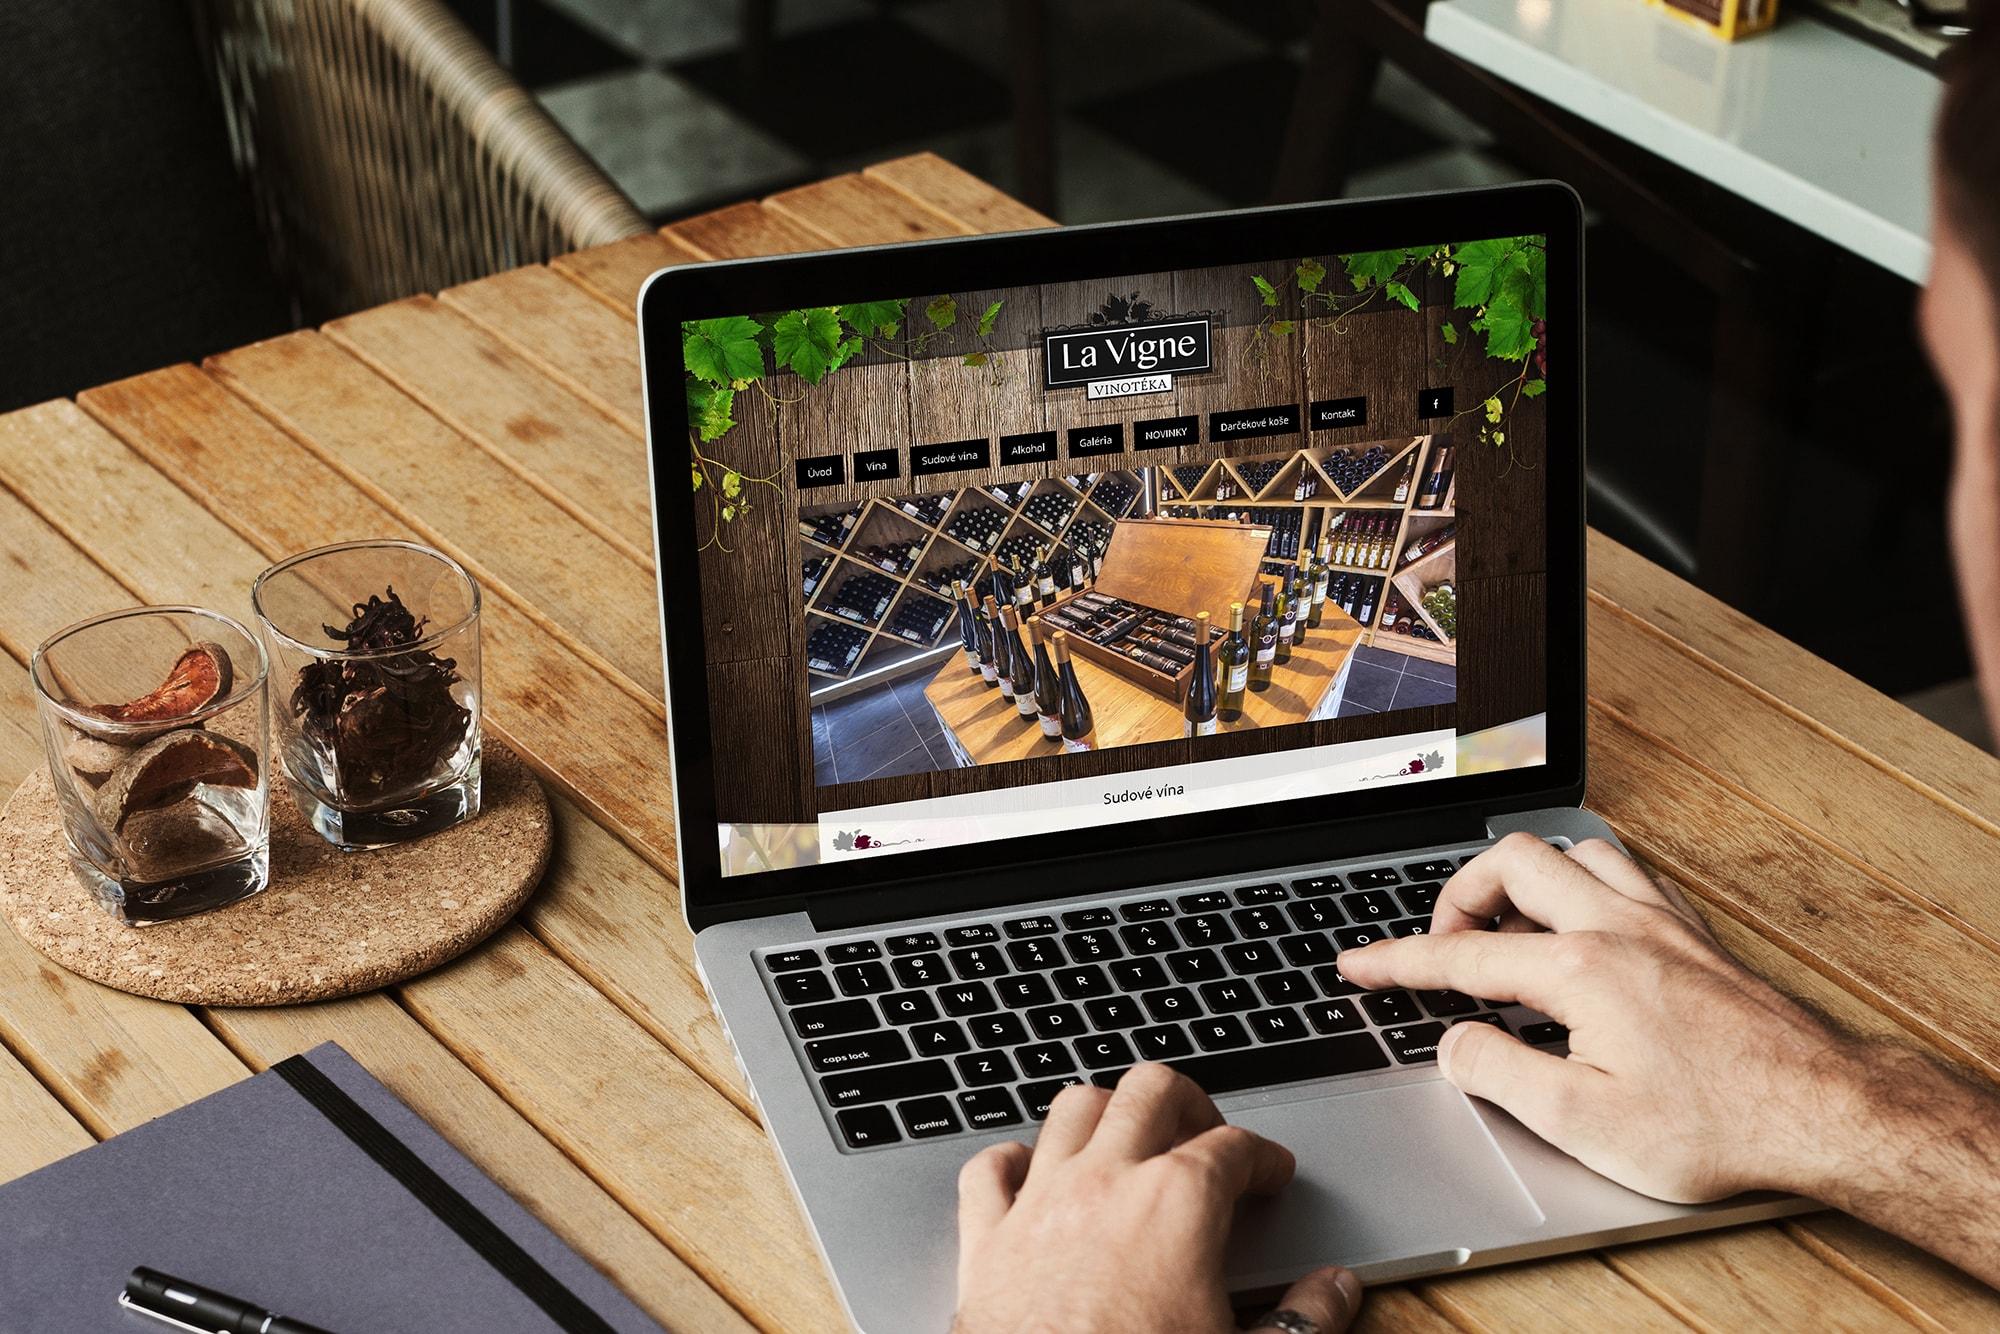 Náhľad web stránky lavigne.sk na notebooku